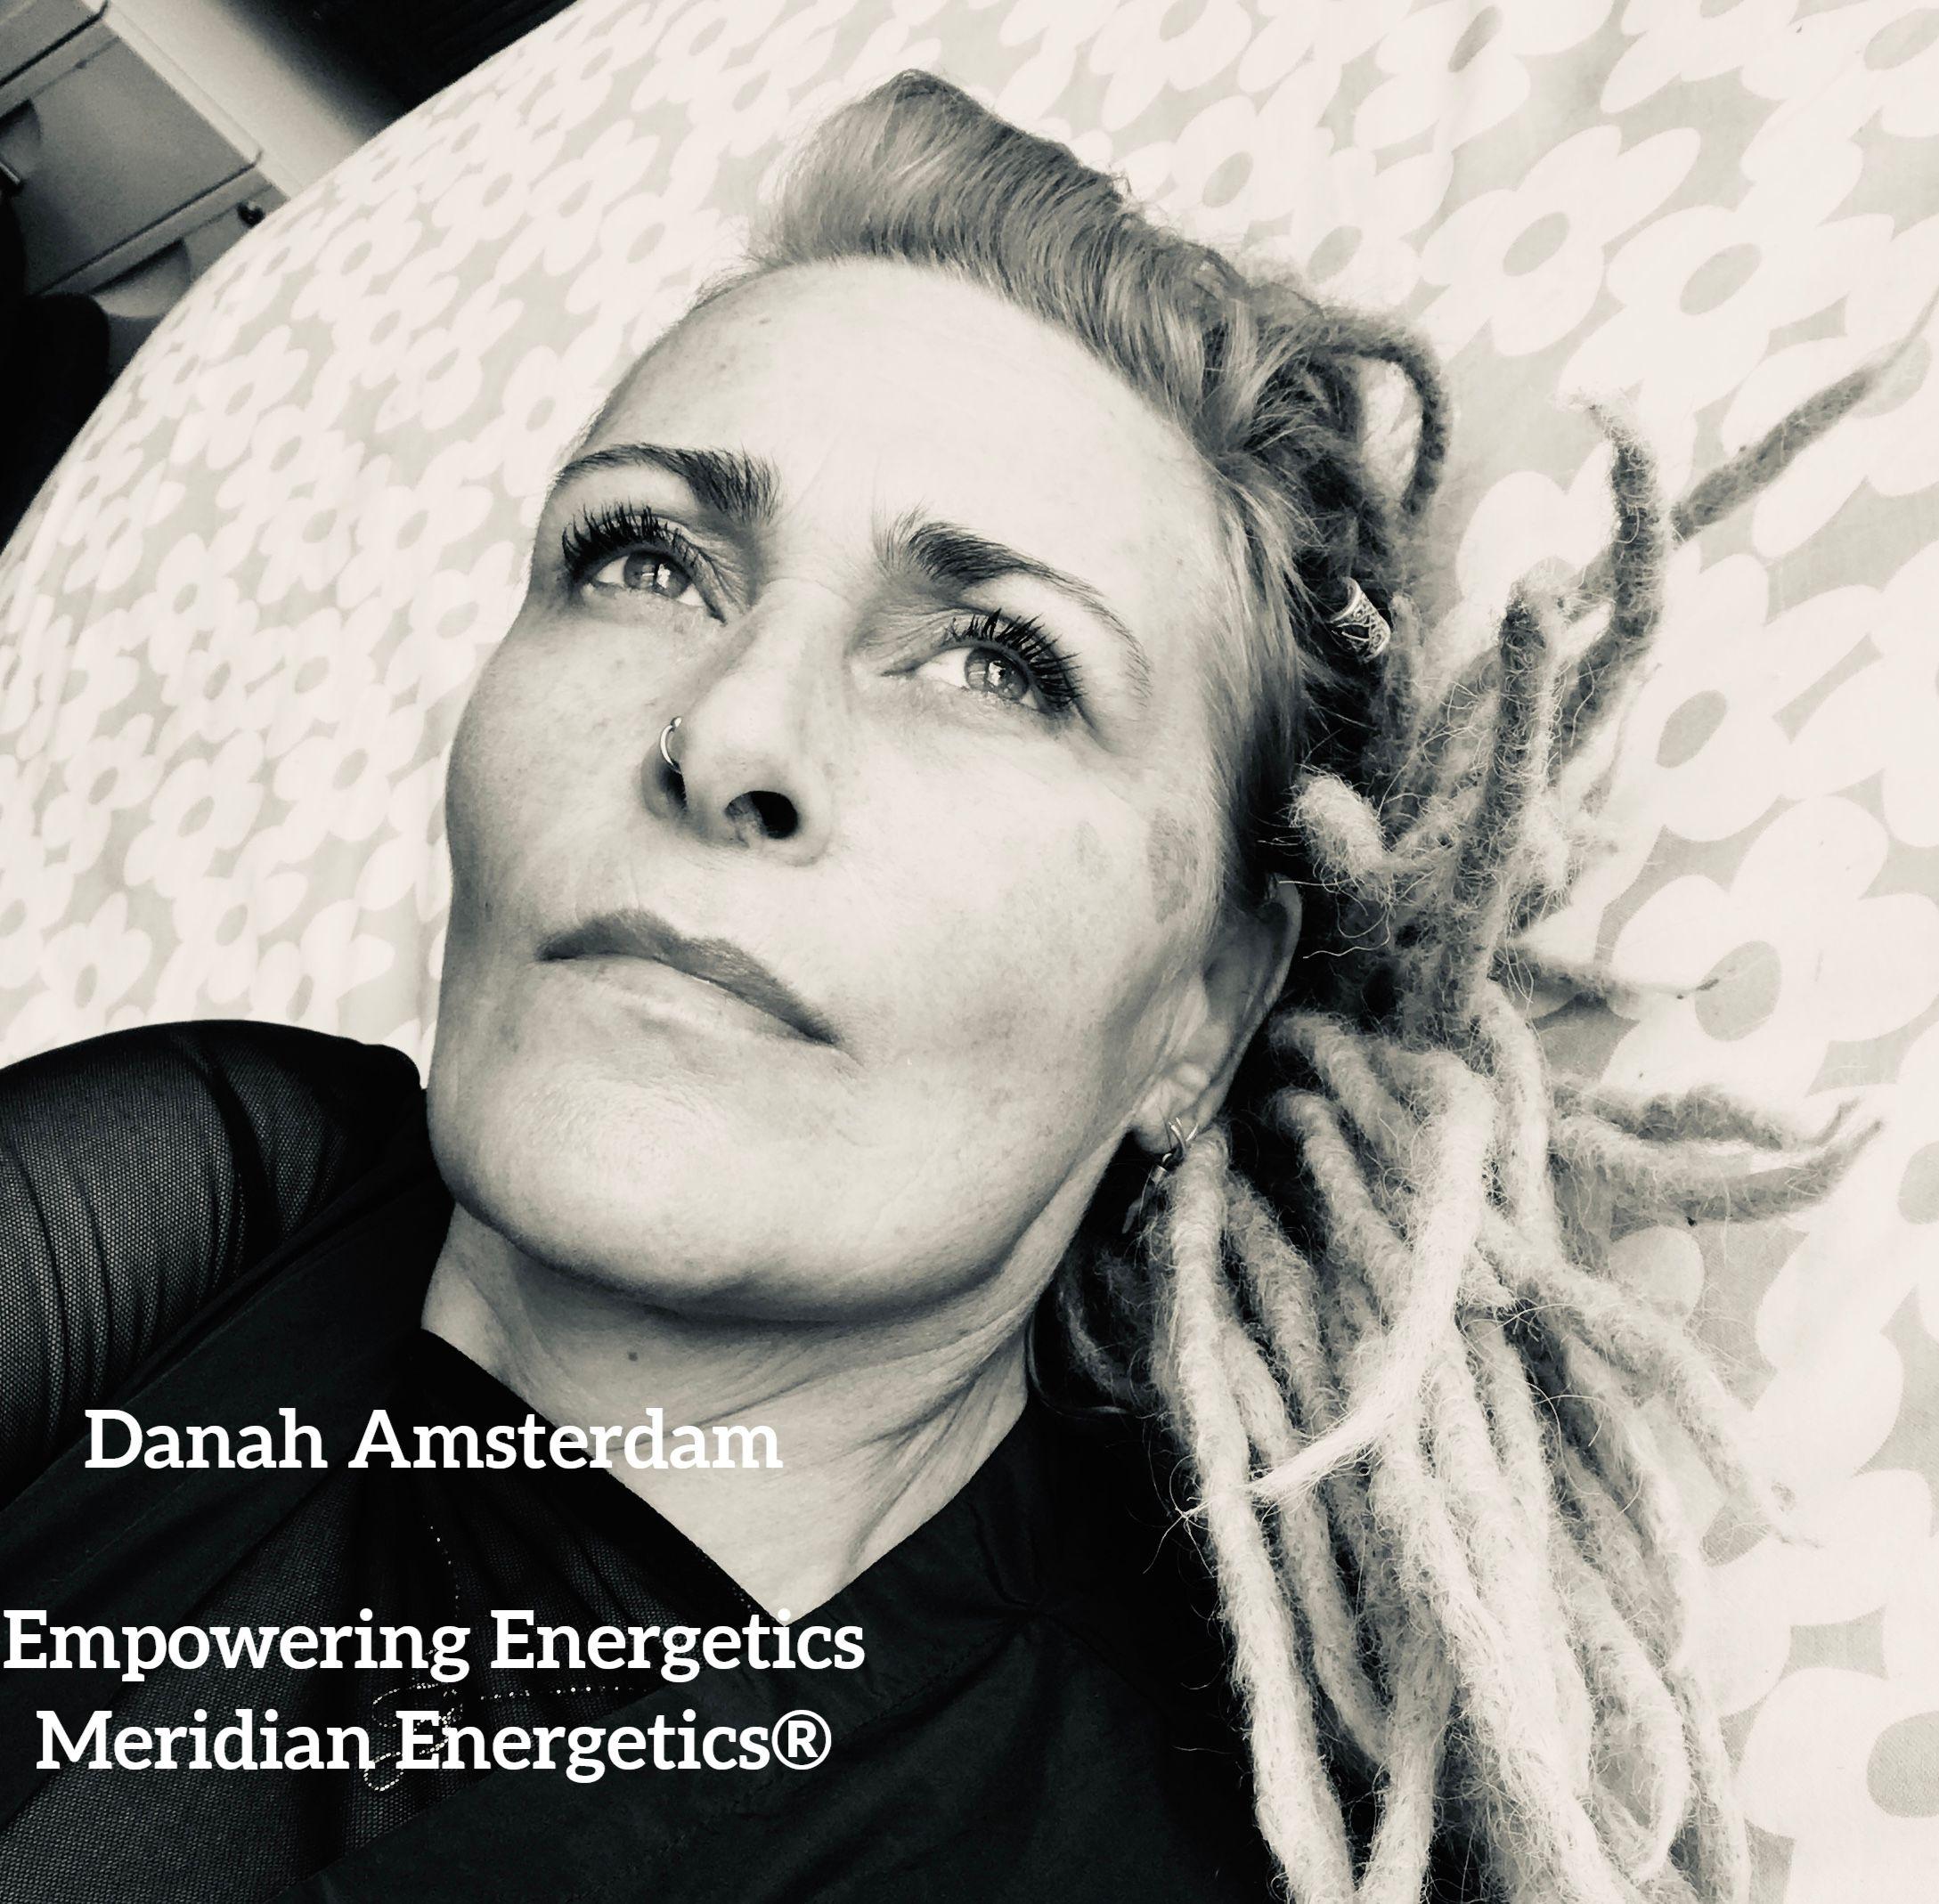 Danah Amsterdam  Empowering Energetics Meridian Energetics®